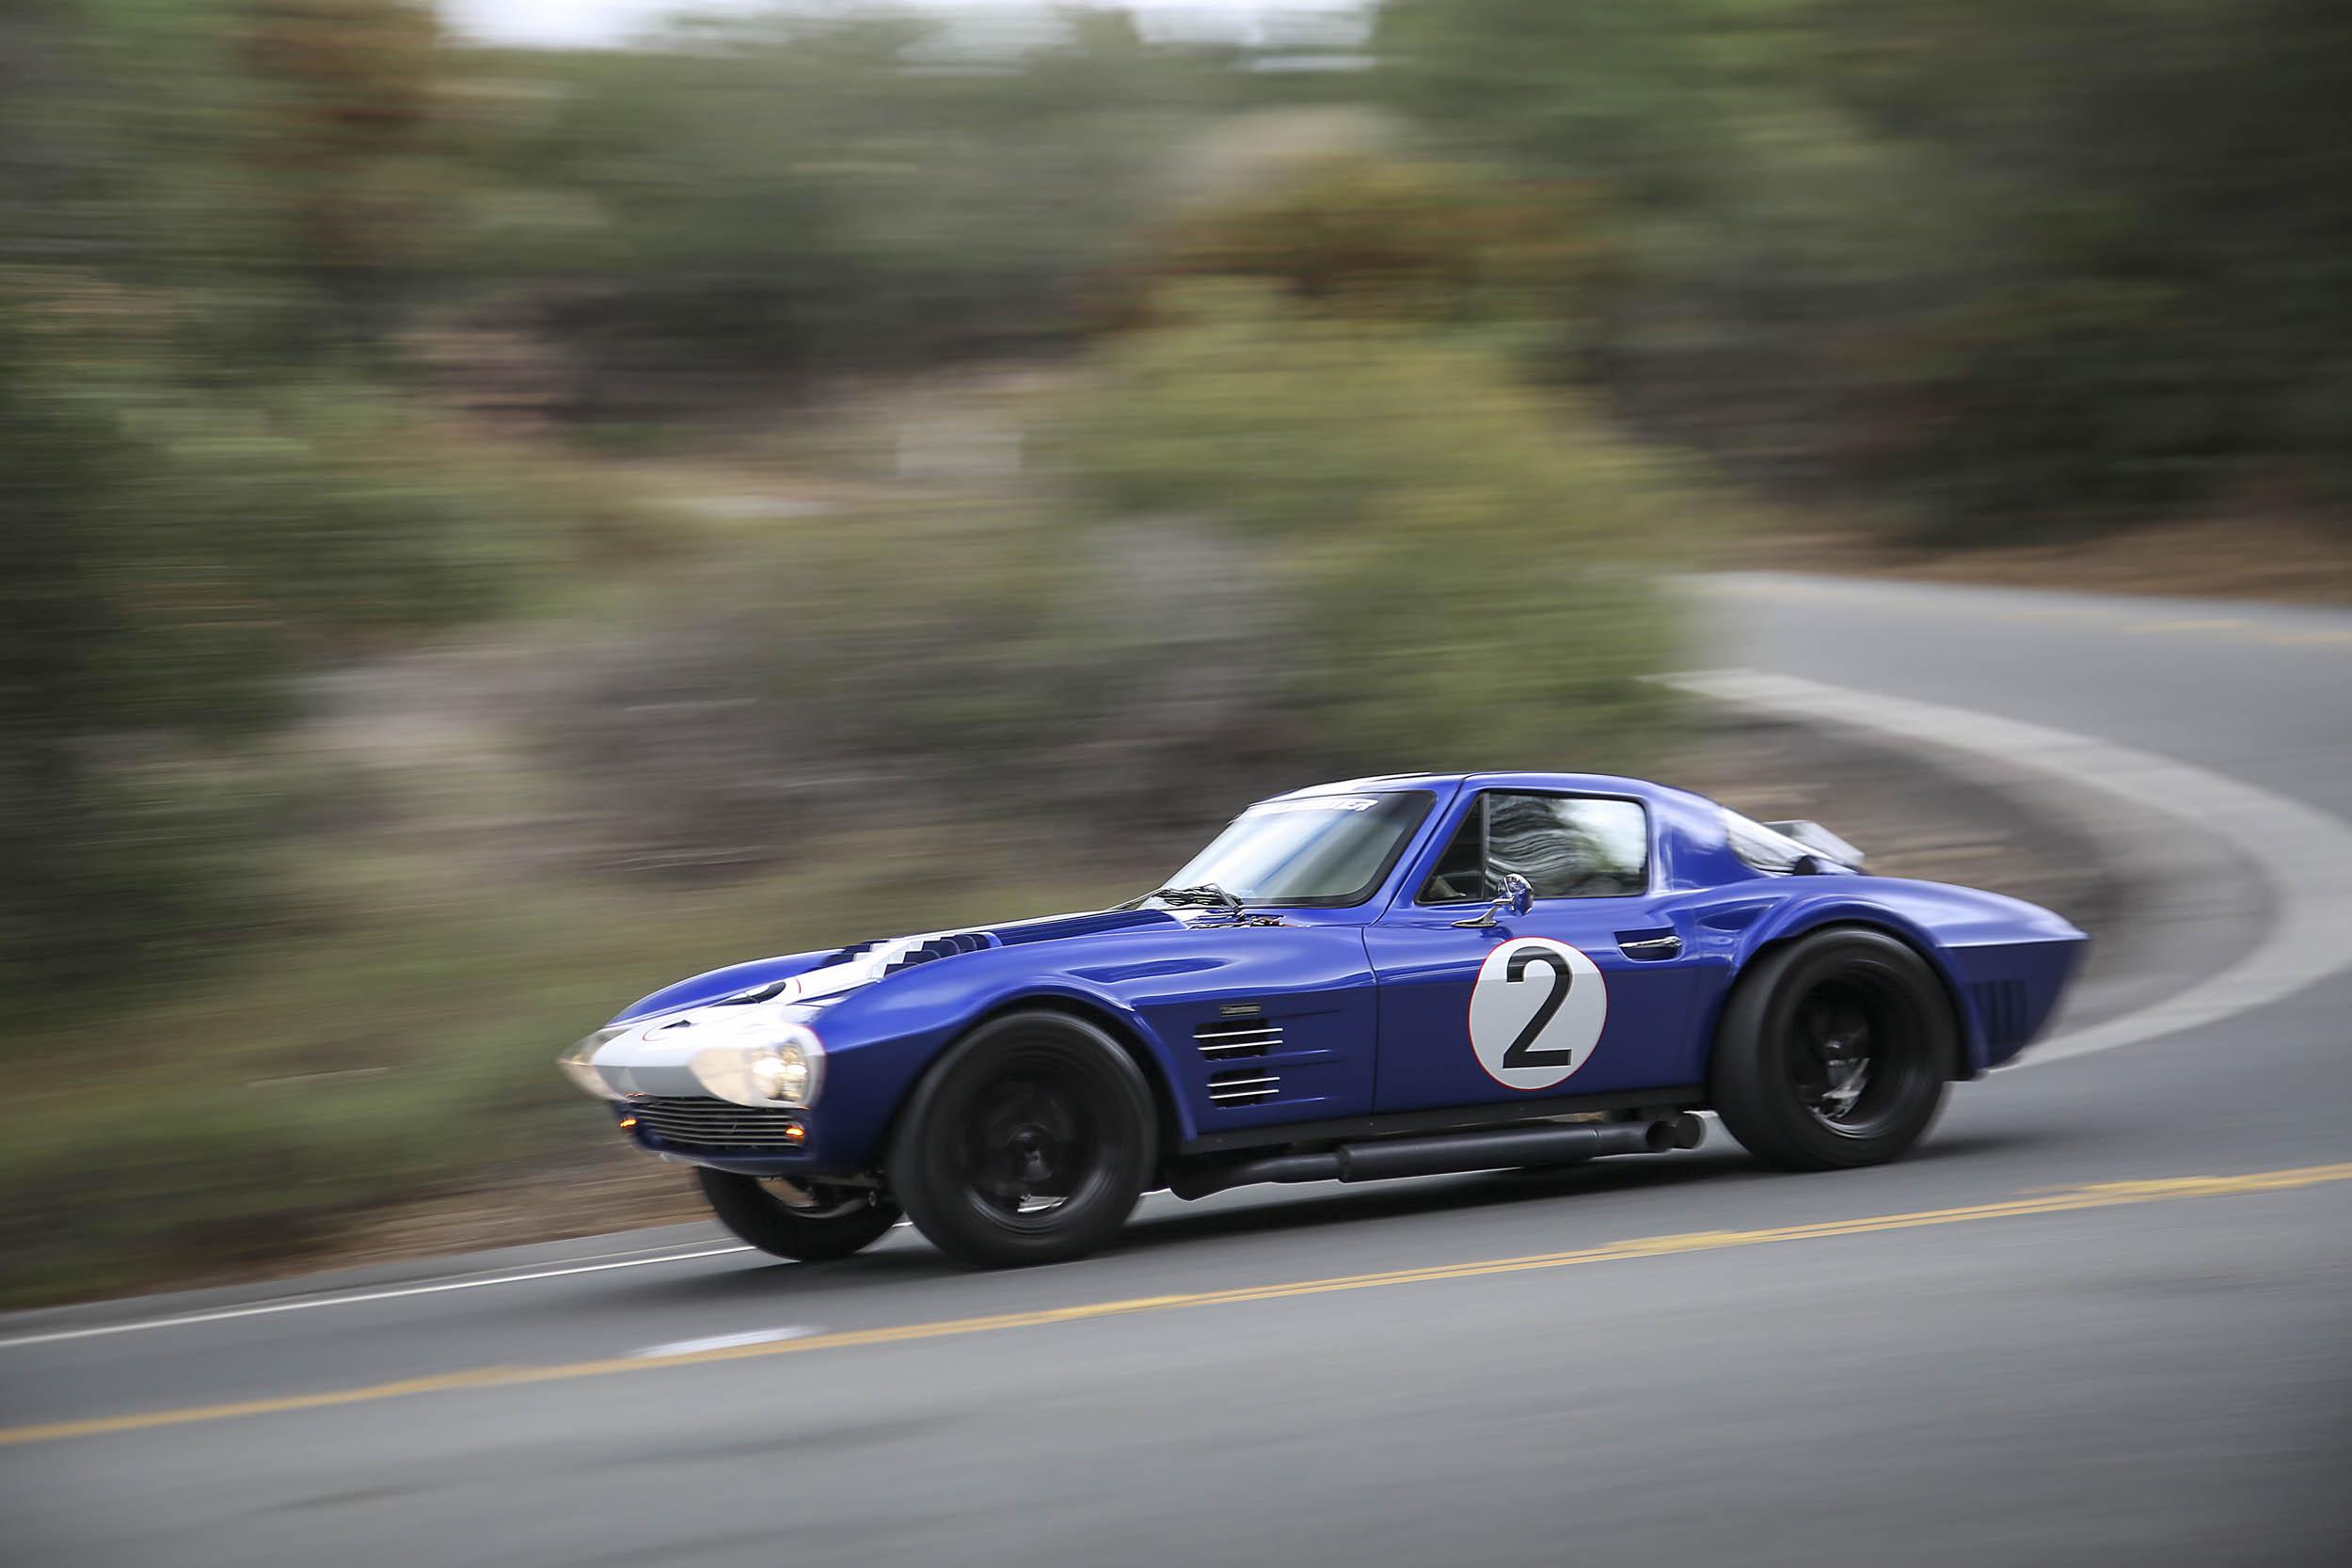 Superformance Corvette Grand Sport profile while driving